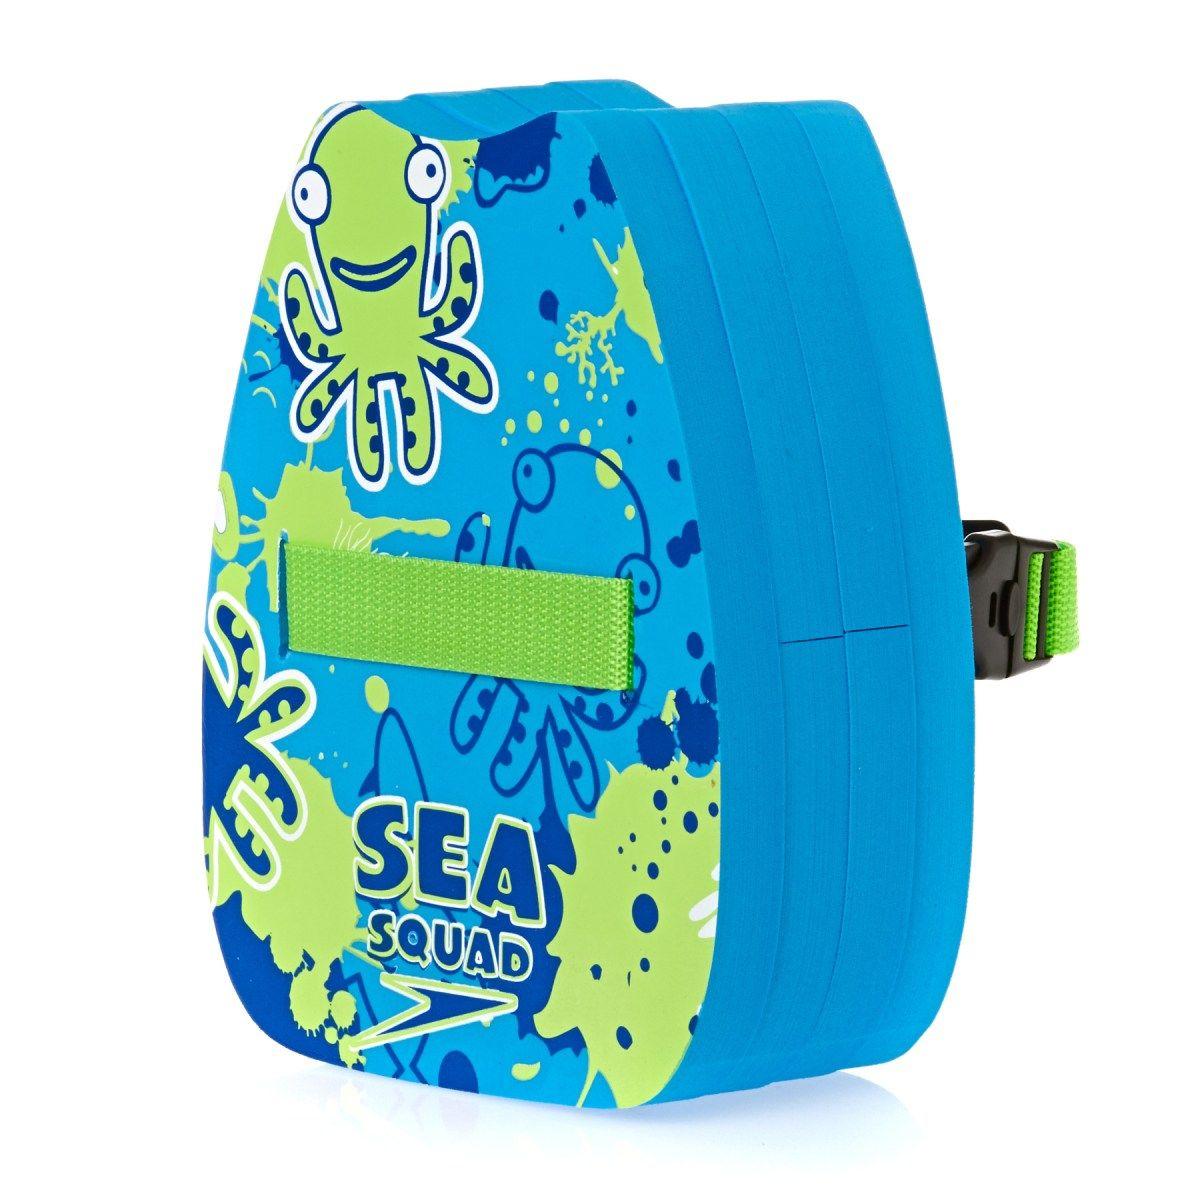 Boy s Speedo Swimming Floats - Speedo Sea Squad Back Float - Japan  Blue hydro Green ba6cb6562a39